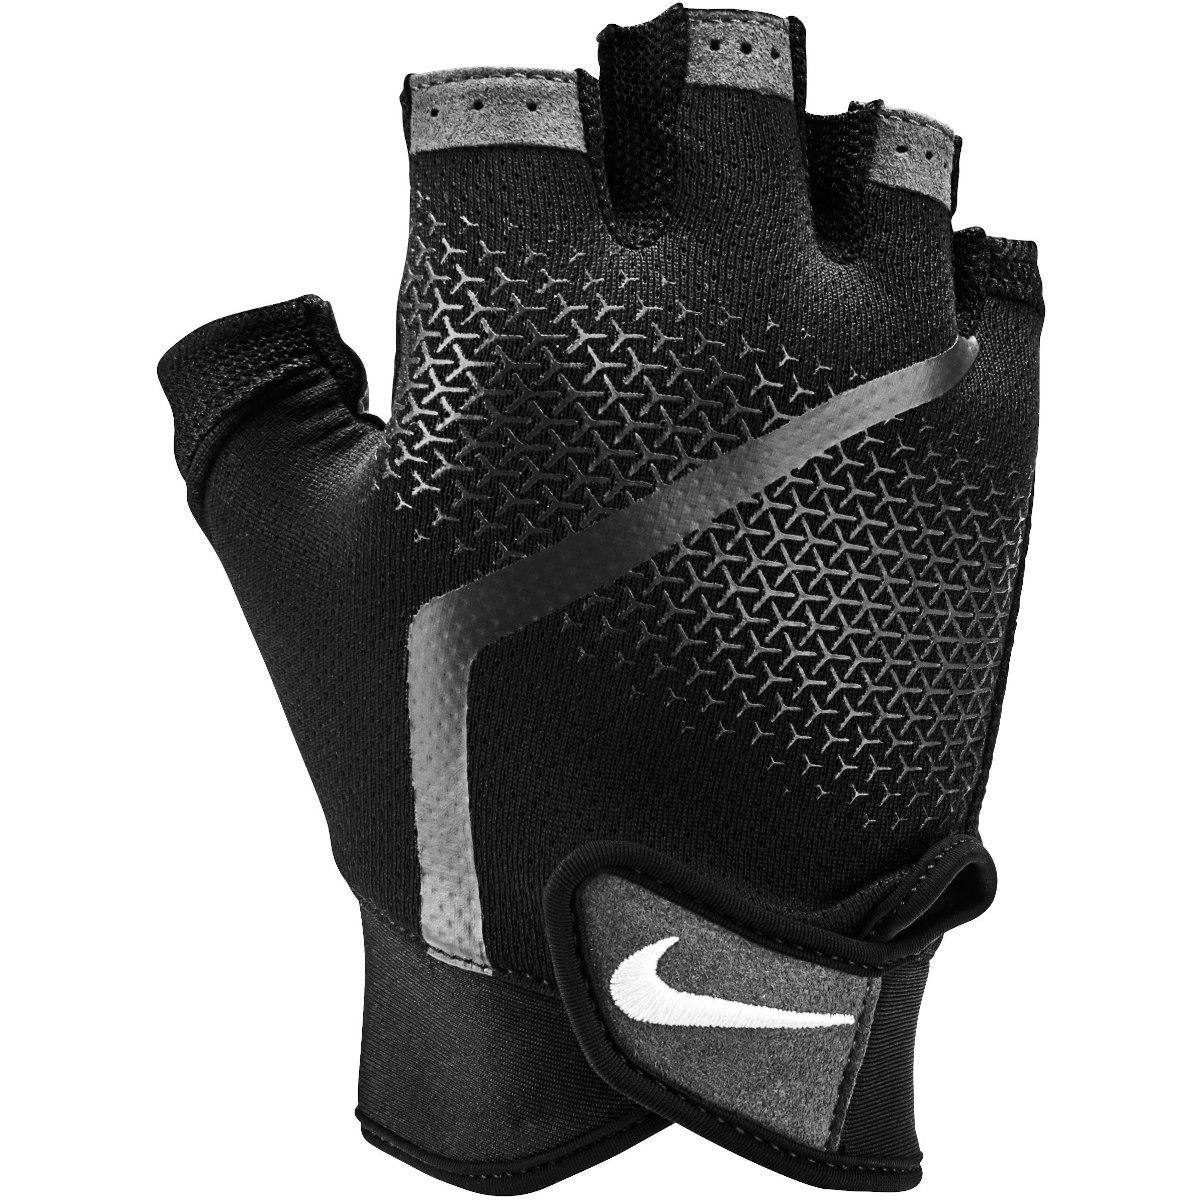 Foto de Nike Extreme Fitness Guantes para Hombre - black/anthracite/white 945